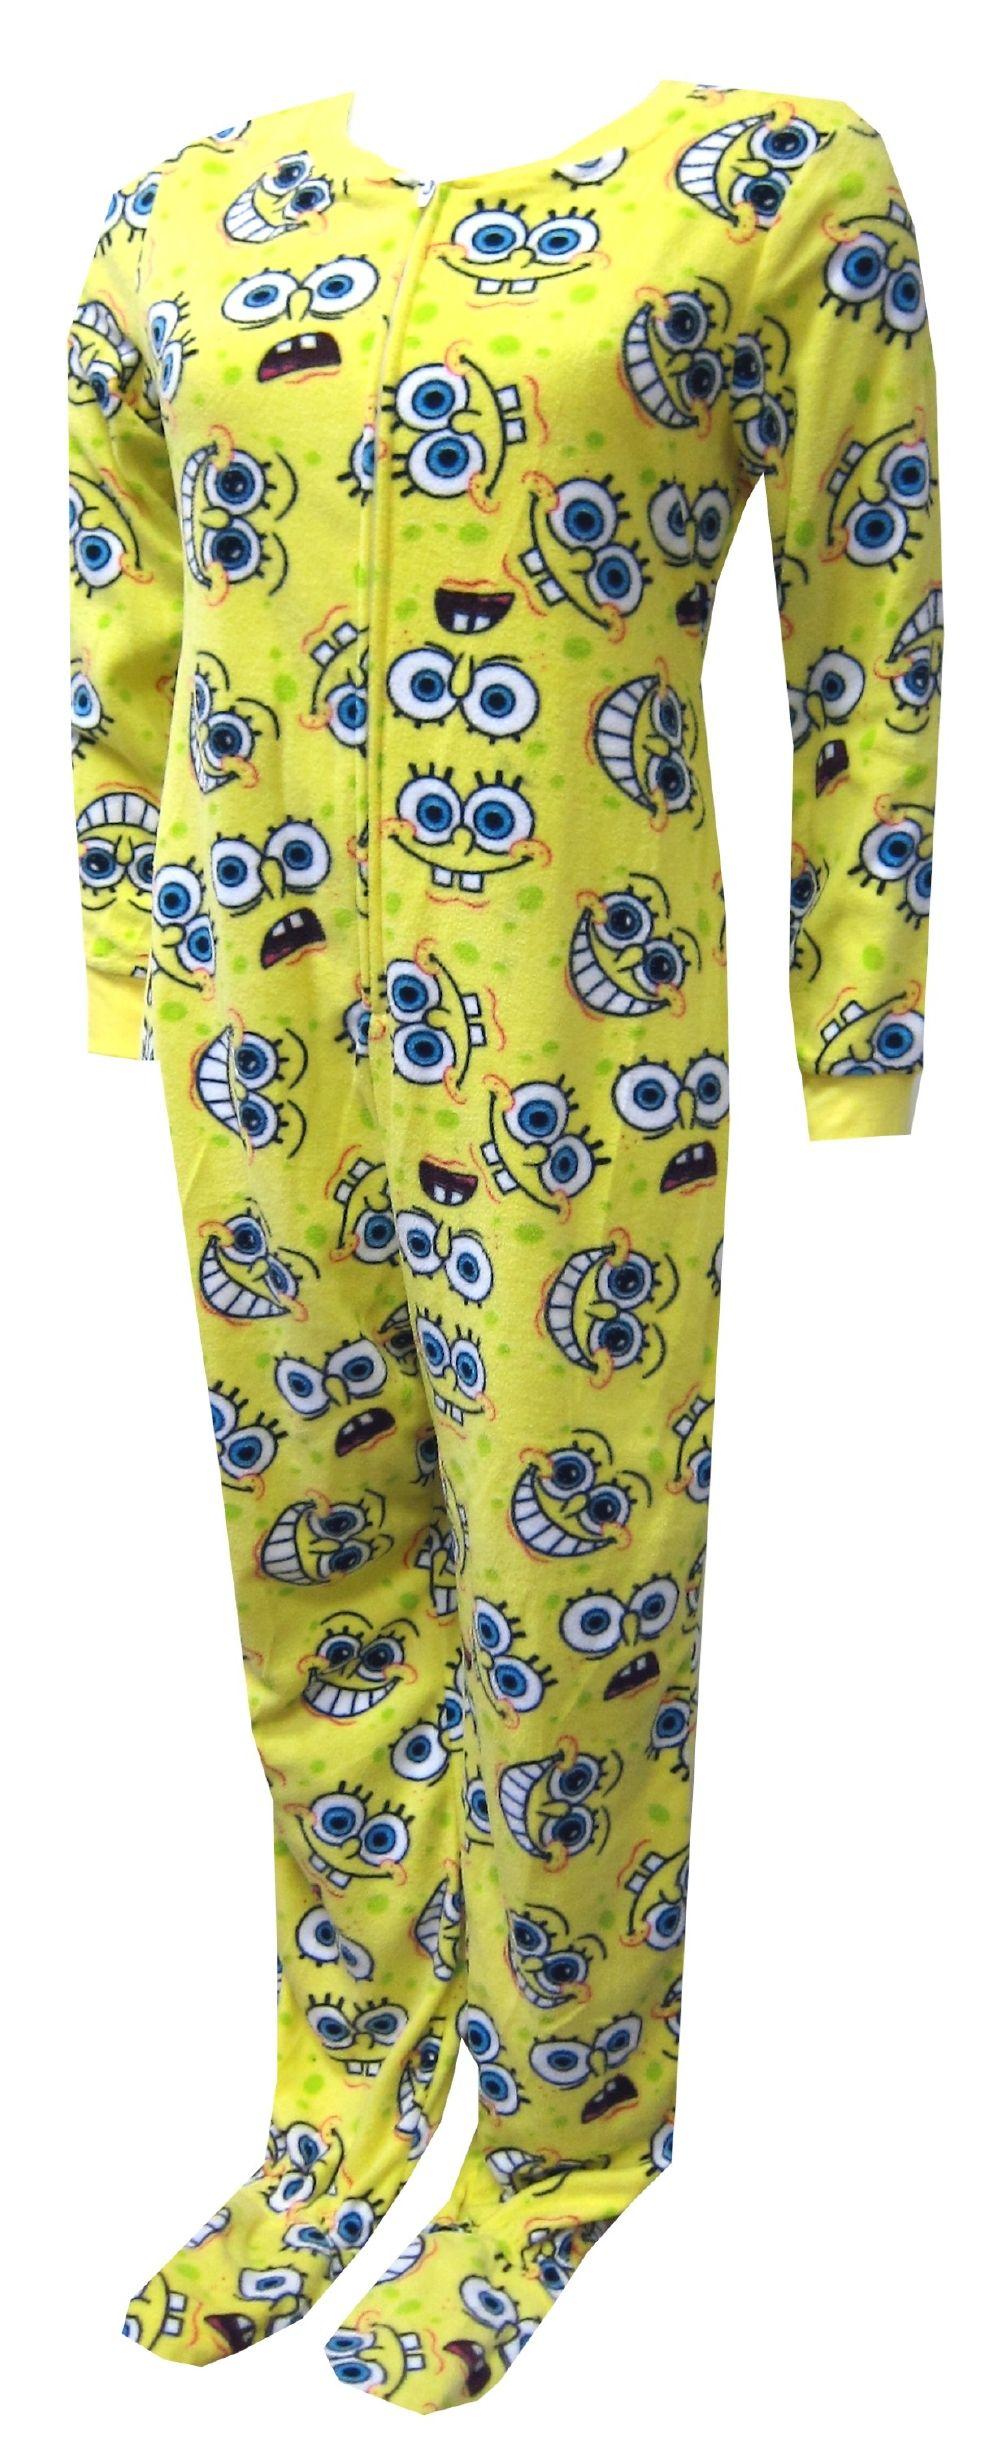 db5792dd8e Pijamas De Una Pieza · These pajama sets for women feature the many faces  of SpongeBob on yellow micro polar fleece